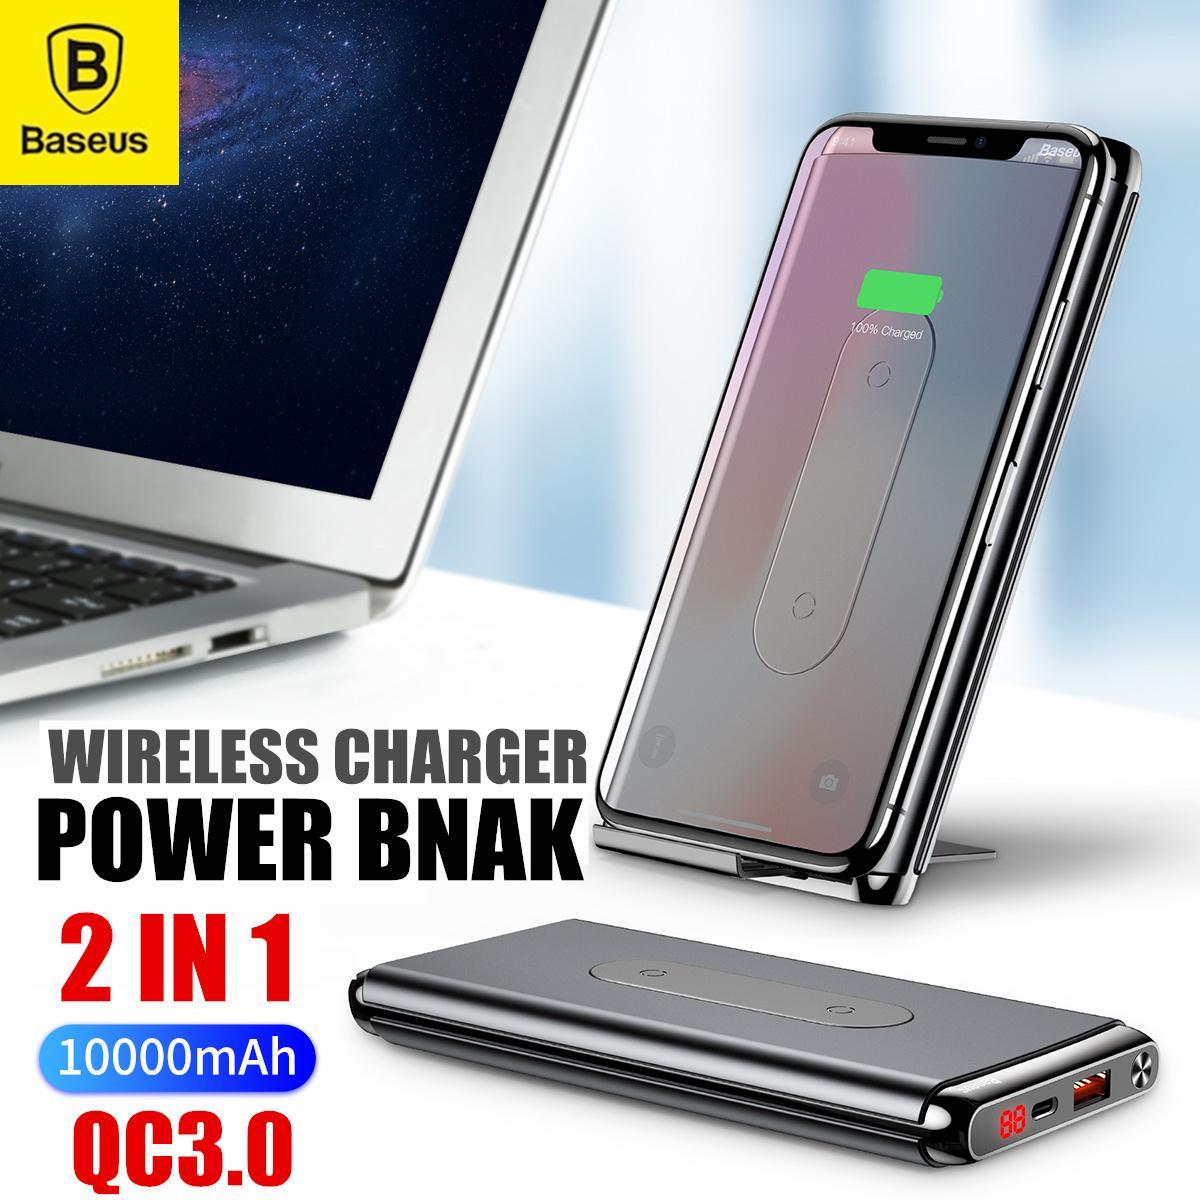 Buy Power Banks Xiaomi Portable Bestseller Powerbank 10000mah Bank Mi Pro 2 10000 Mah Fast Charging Baseus Bracket Wireless Charger Qc30 Digital Display Charge